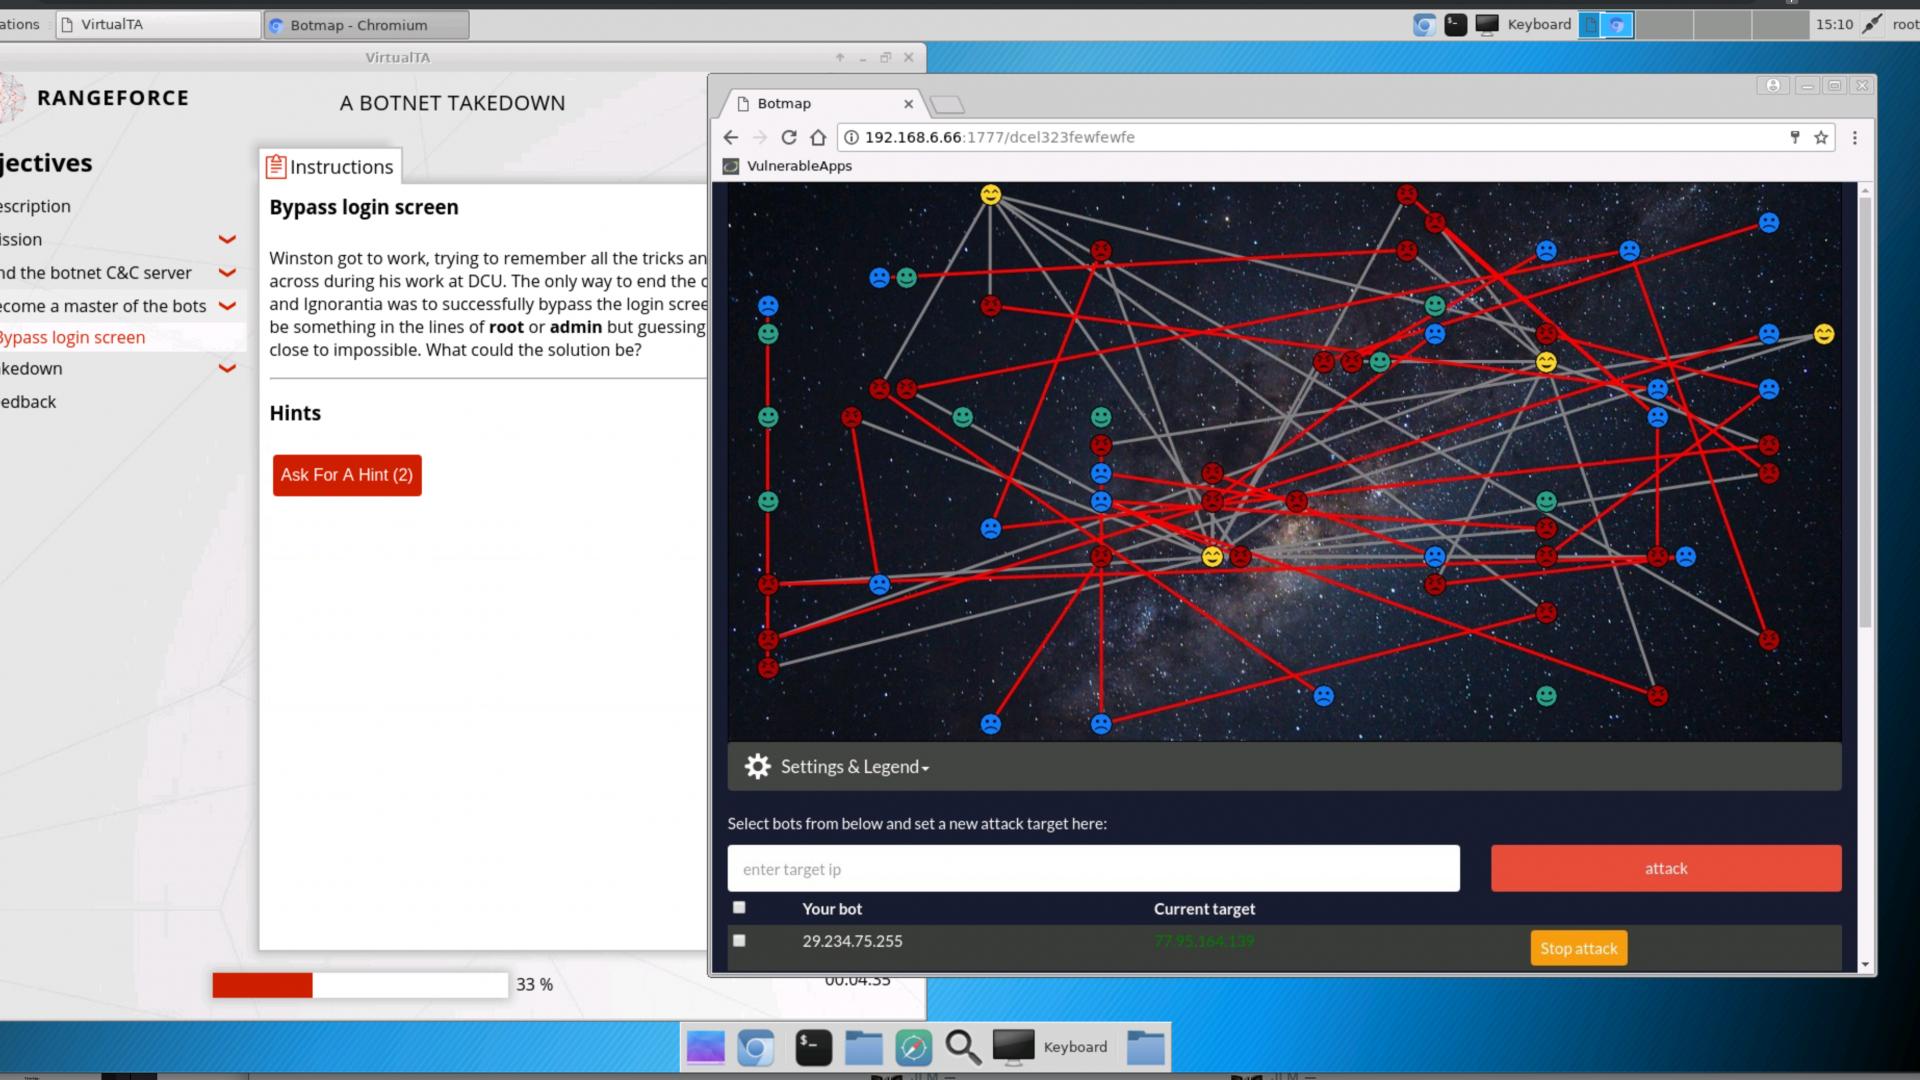 SaaS-based Cybersecurity Training